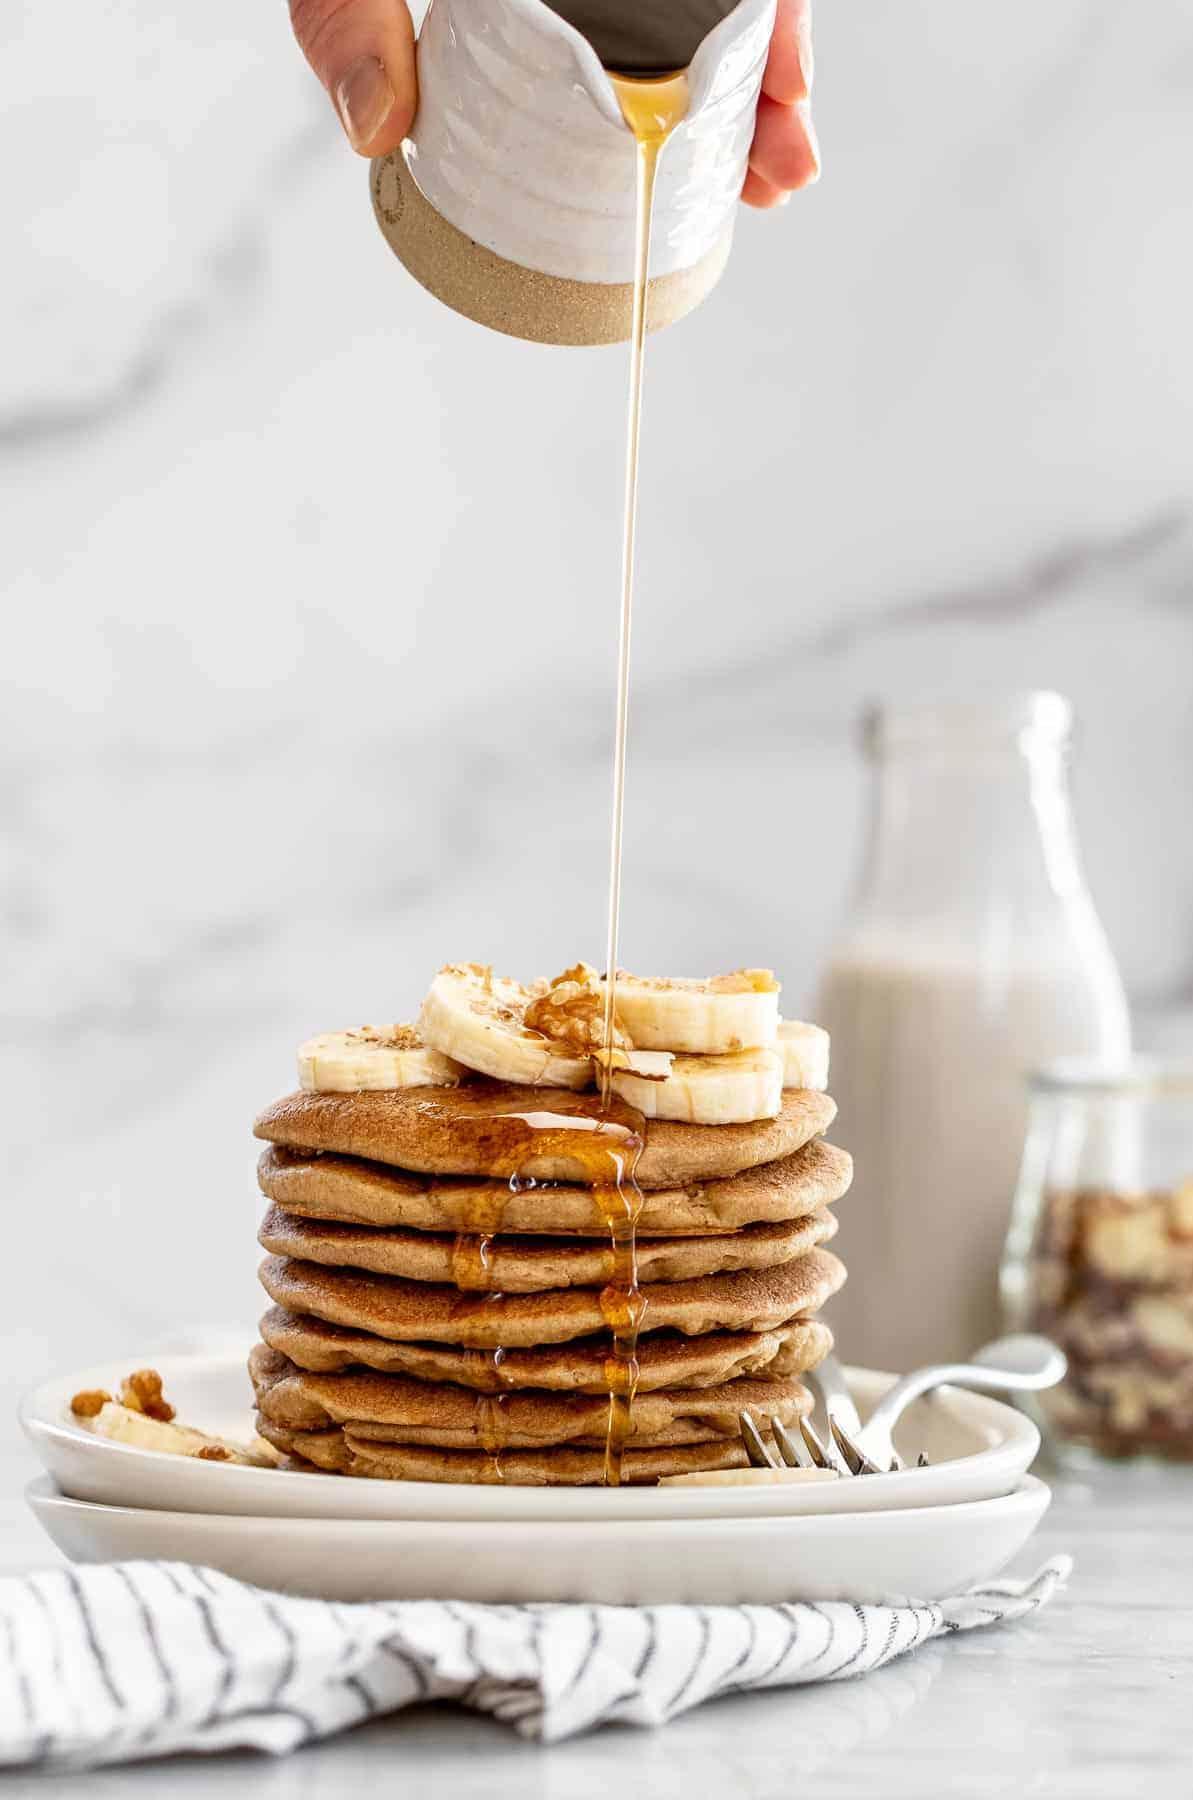 Vegan banana pancakes with maple syrup.